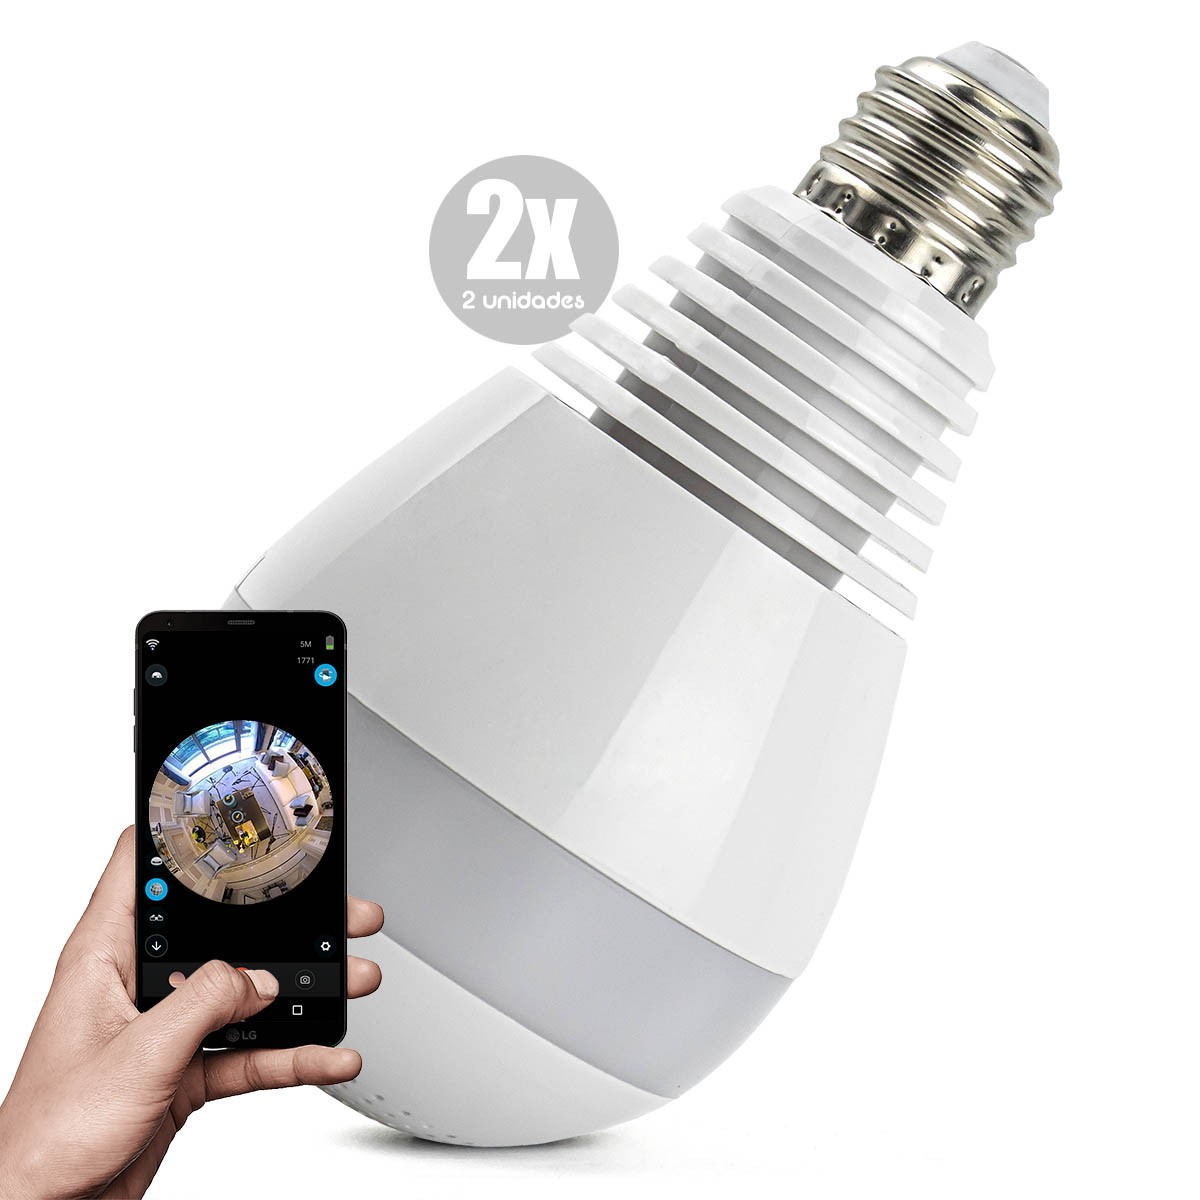 KIT 2x Câmera IP Wi-fi Panorâmica 360º Lâmpada LED Espiã Ipega KP-CA153